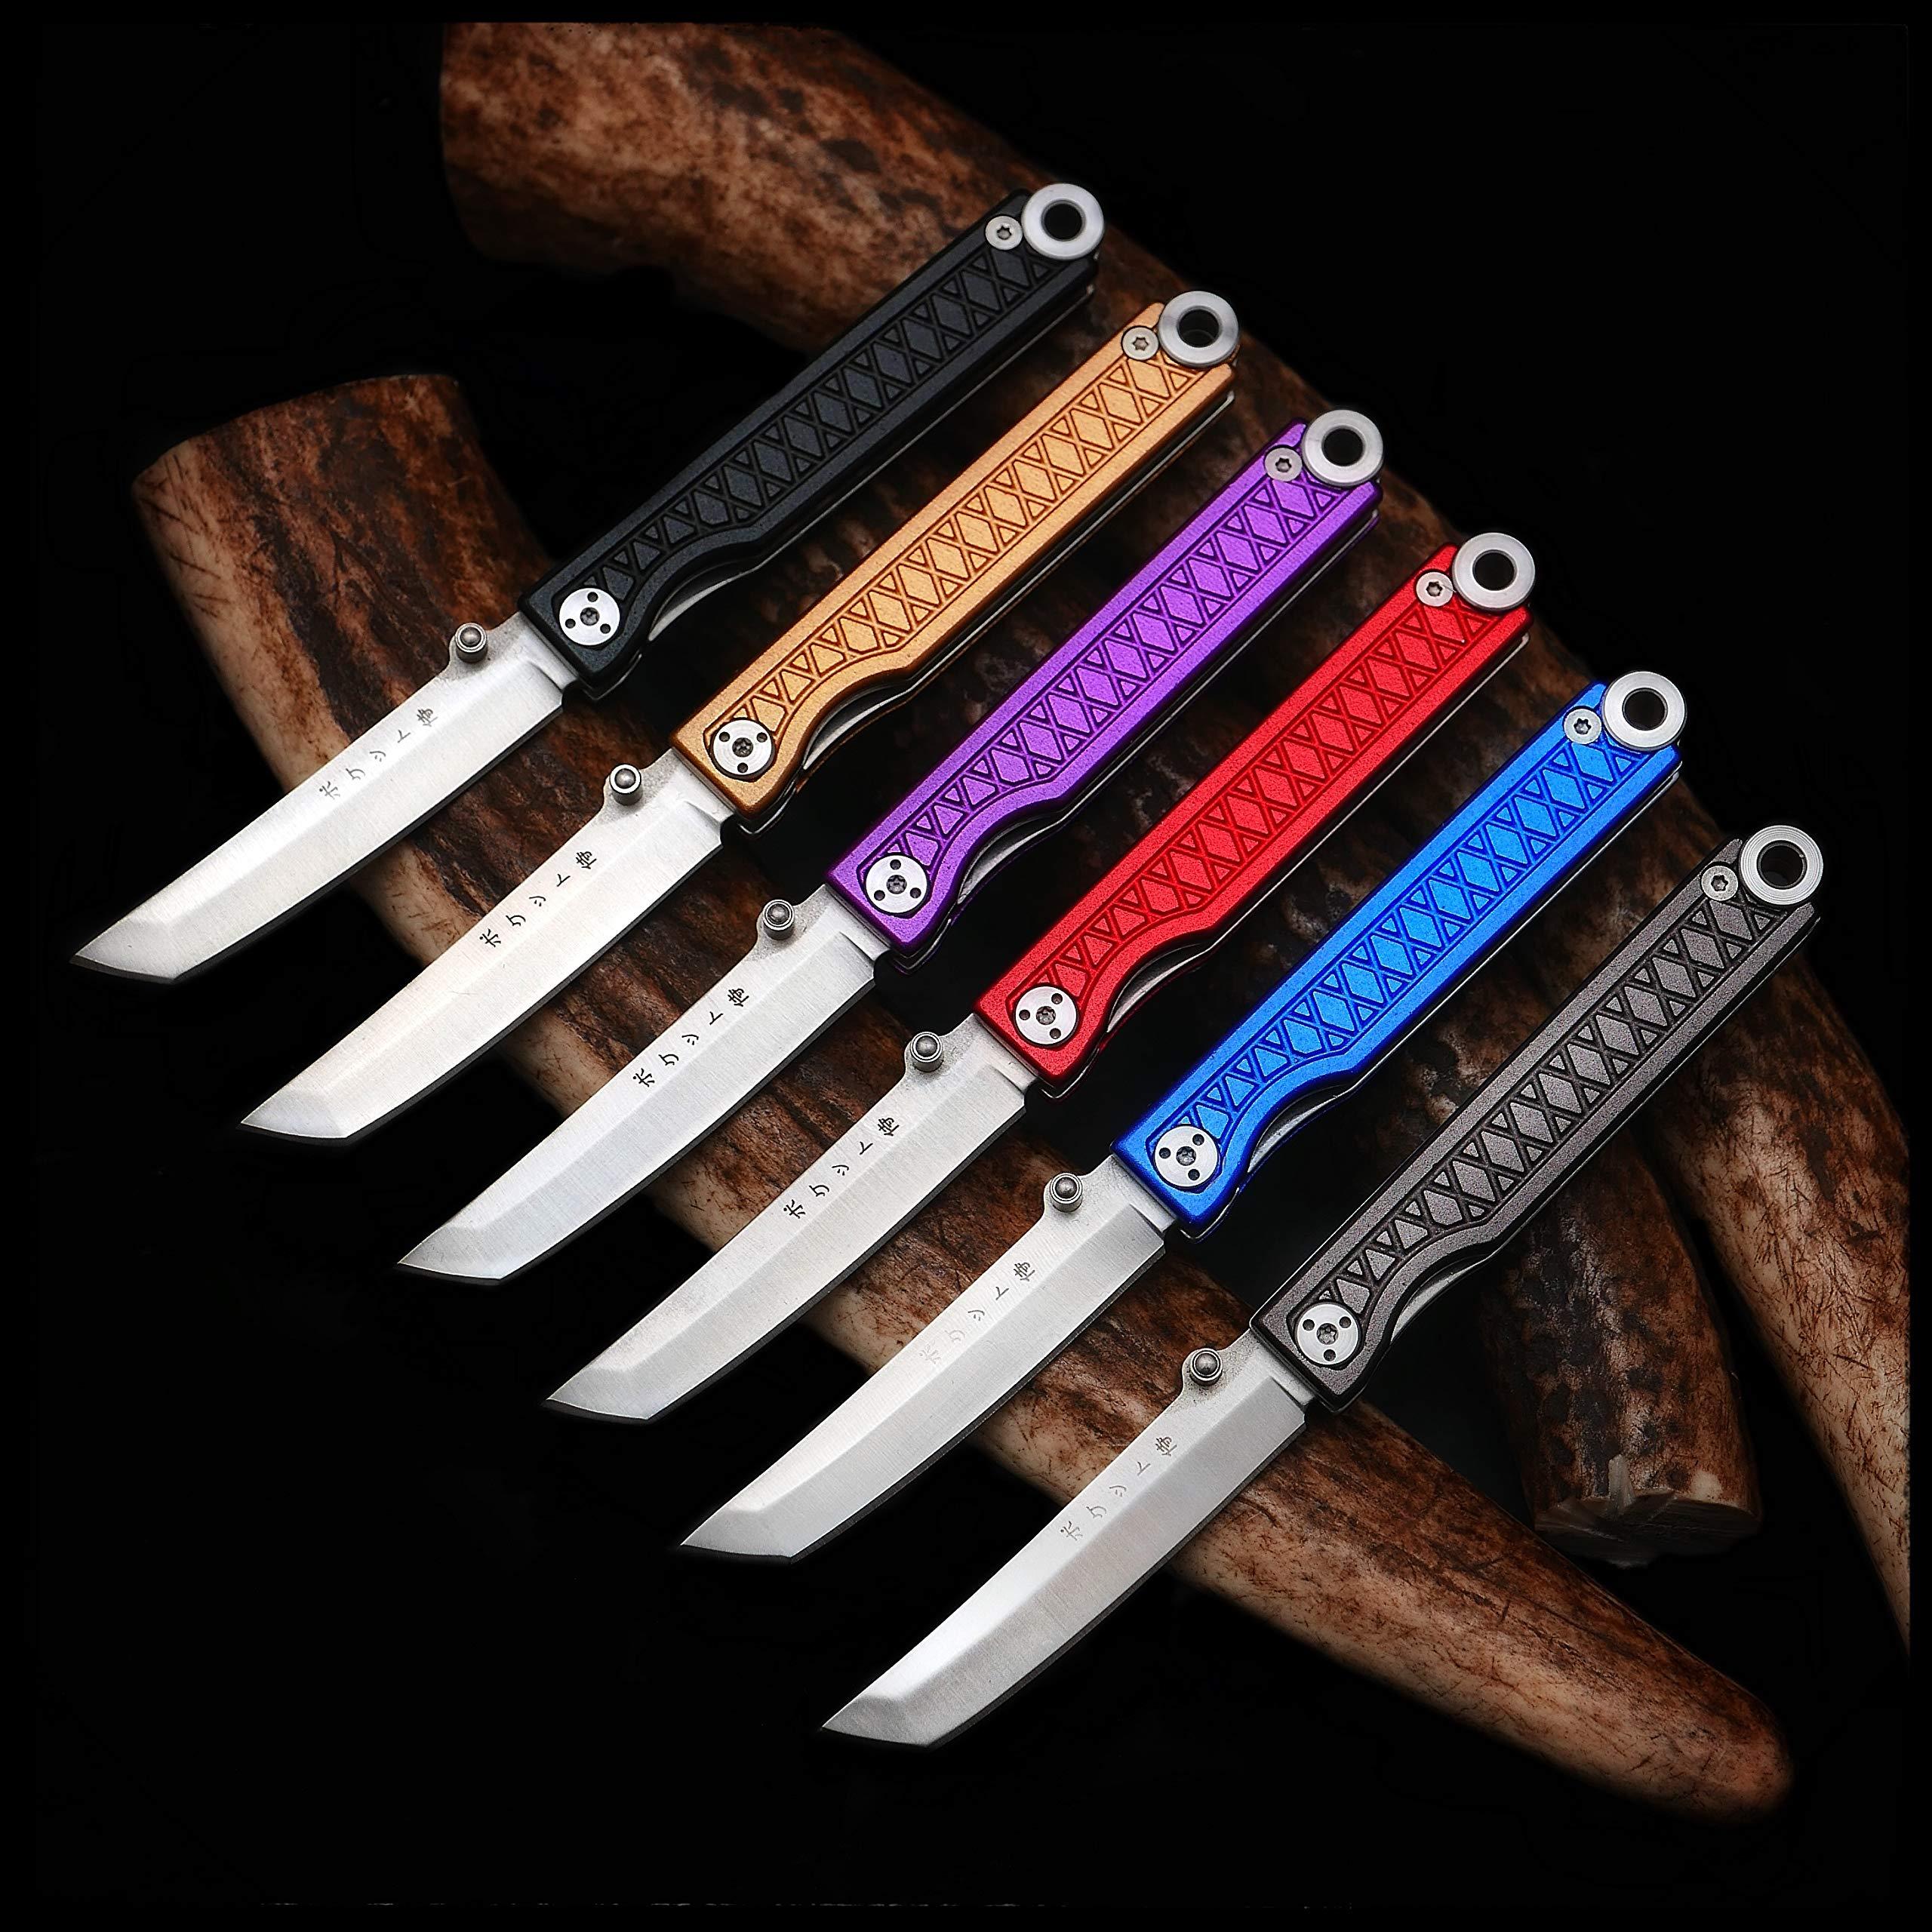 StatGear Pocket Samurai Higonokami Folding Knife 440C Stainless Steel - Aluminum Edition (Black/Bronze) by StatGear (Image #3)